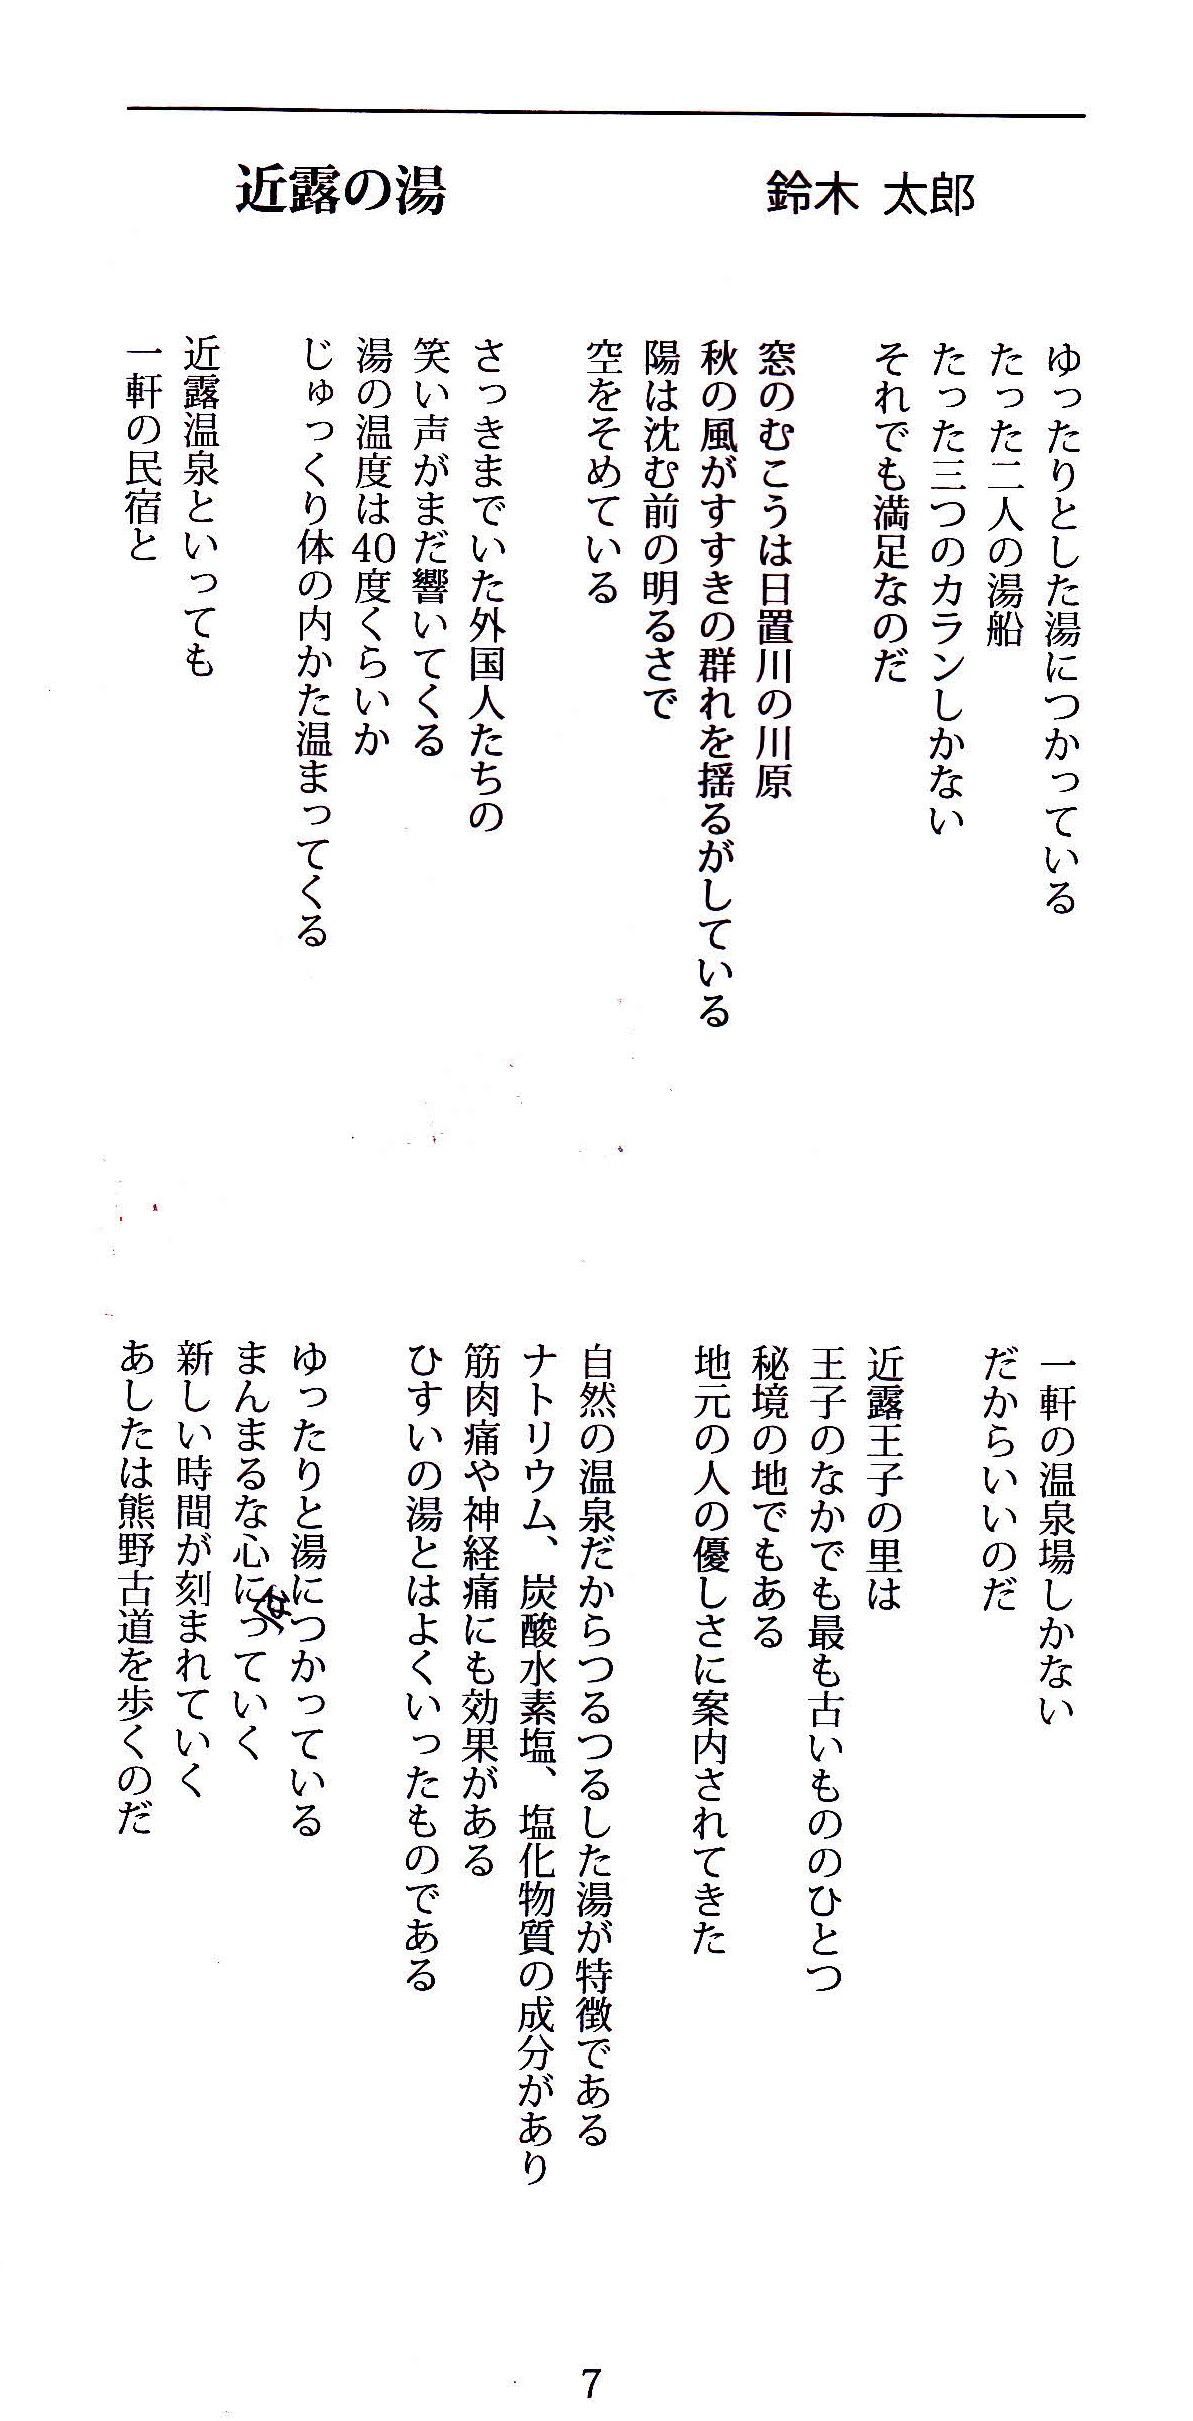 太郎の部屋 36号